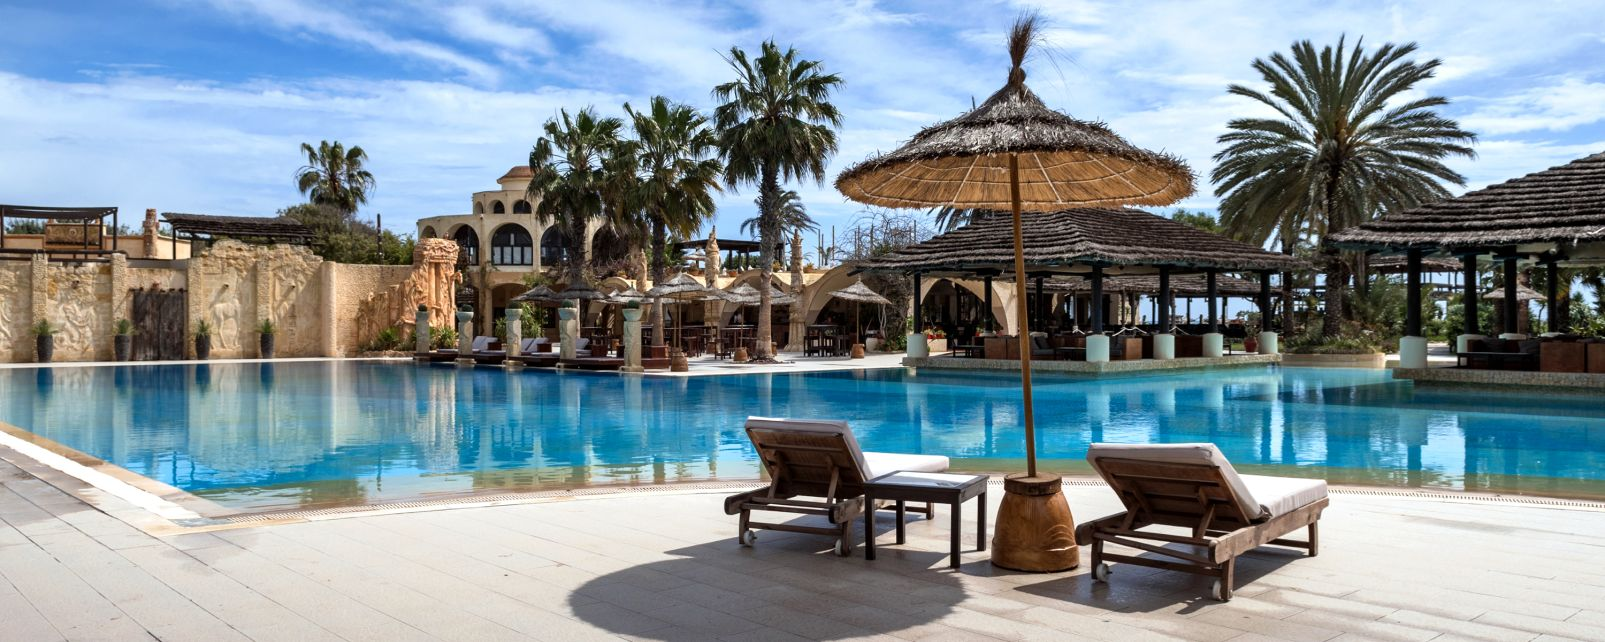 Hôtel Africa Jade Thalasso